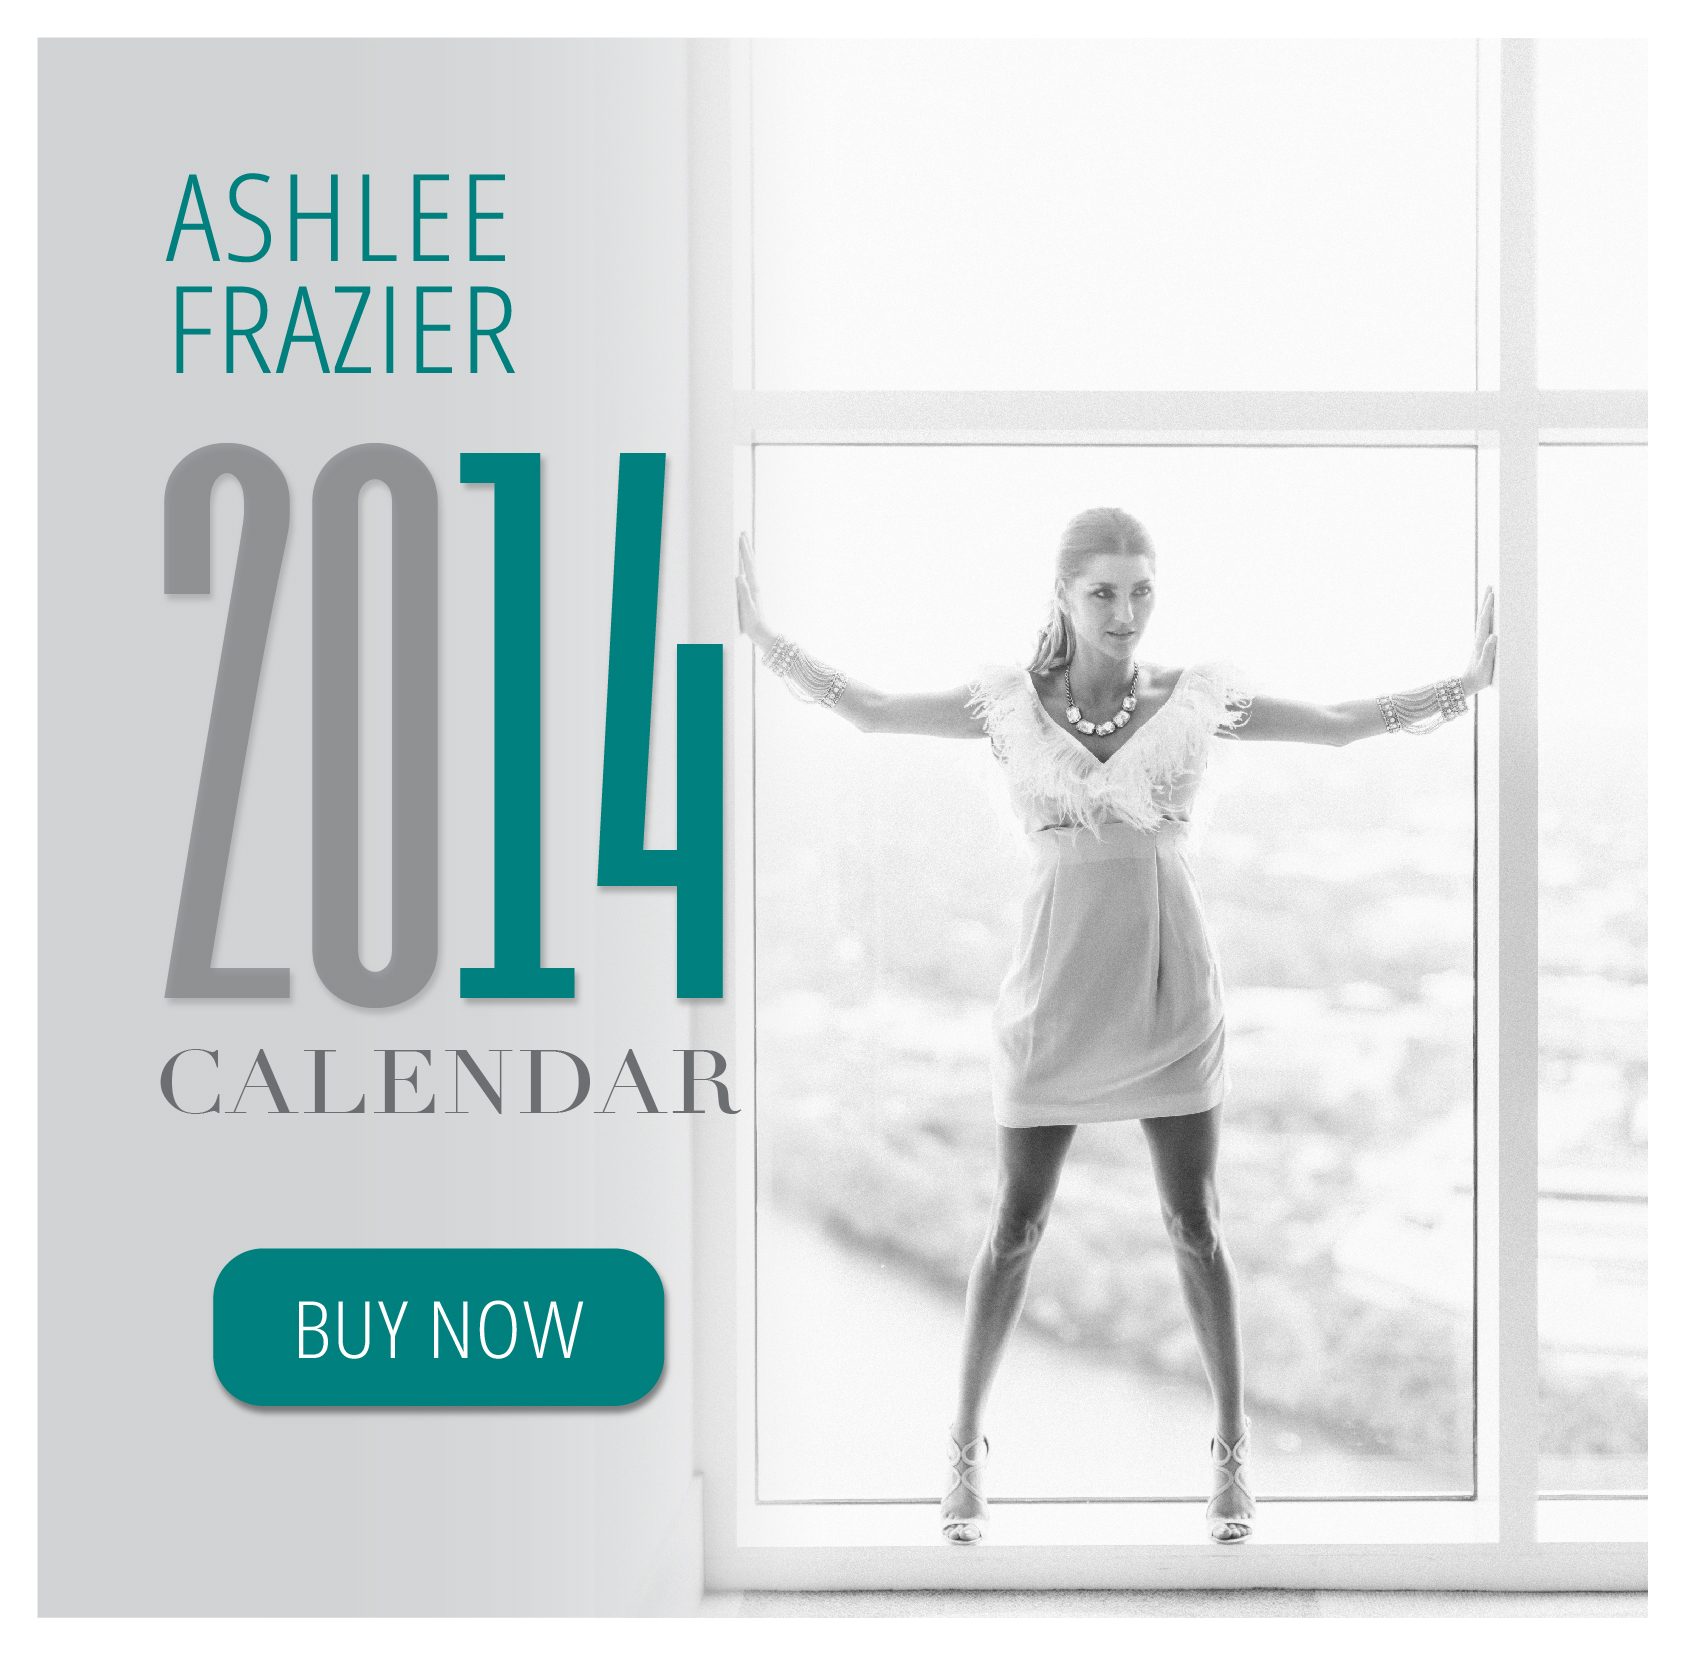 AshLee Frazier calendar-02.jpg